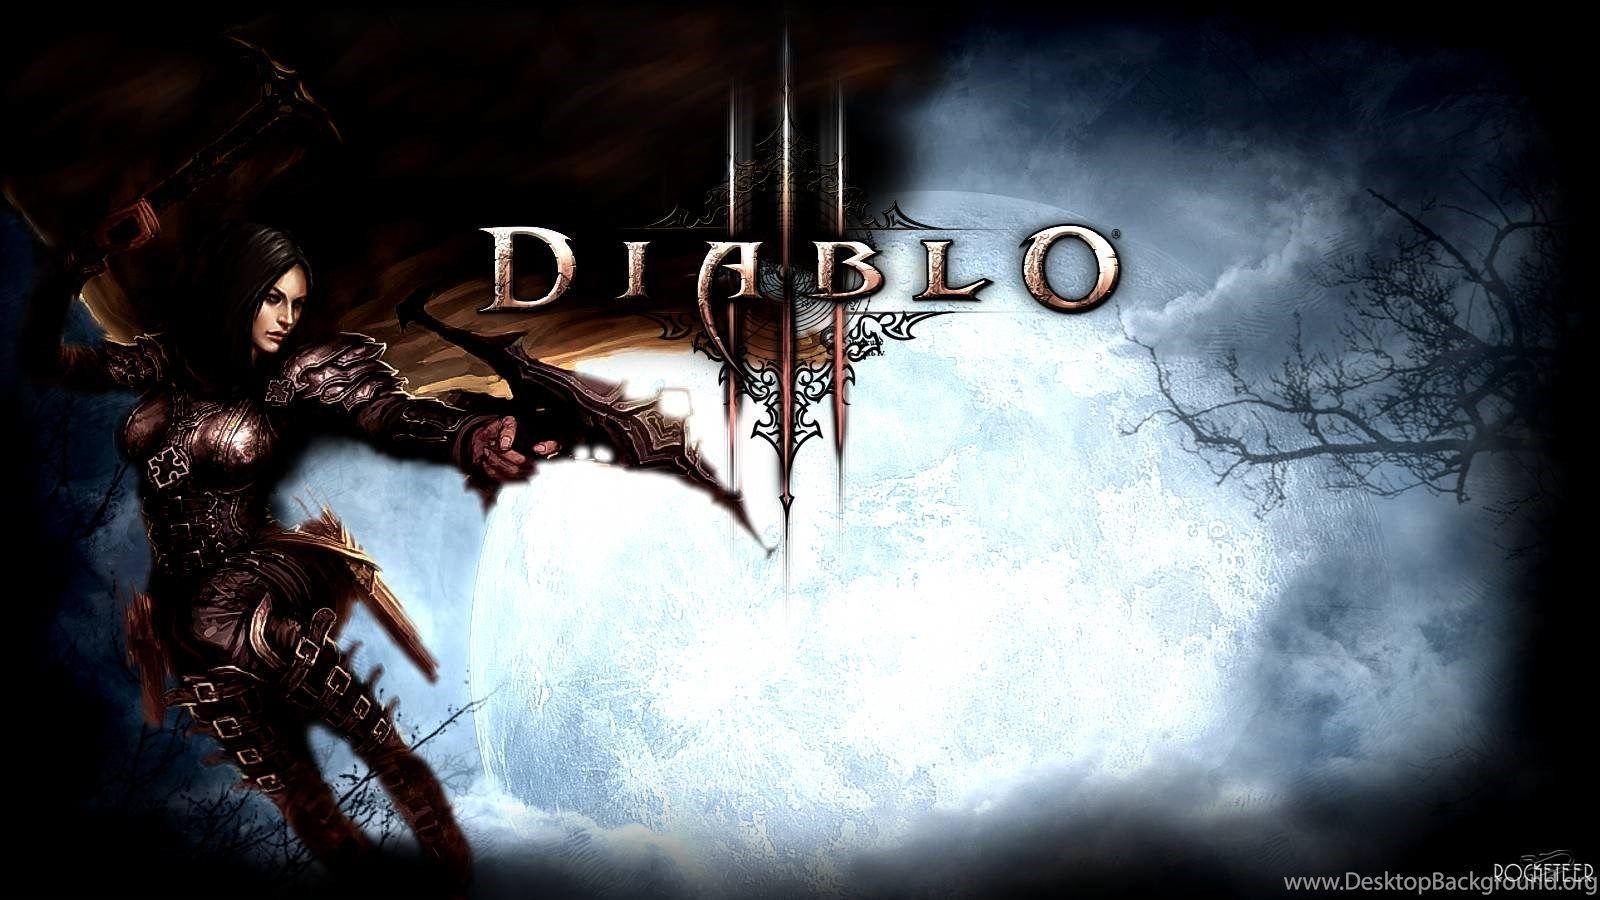 Diablo 3 Demon Hunter Wallpapers Hd Wallpaper Cave